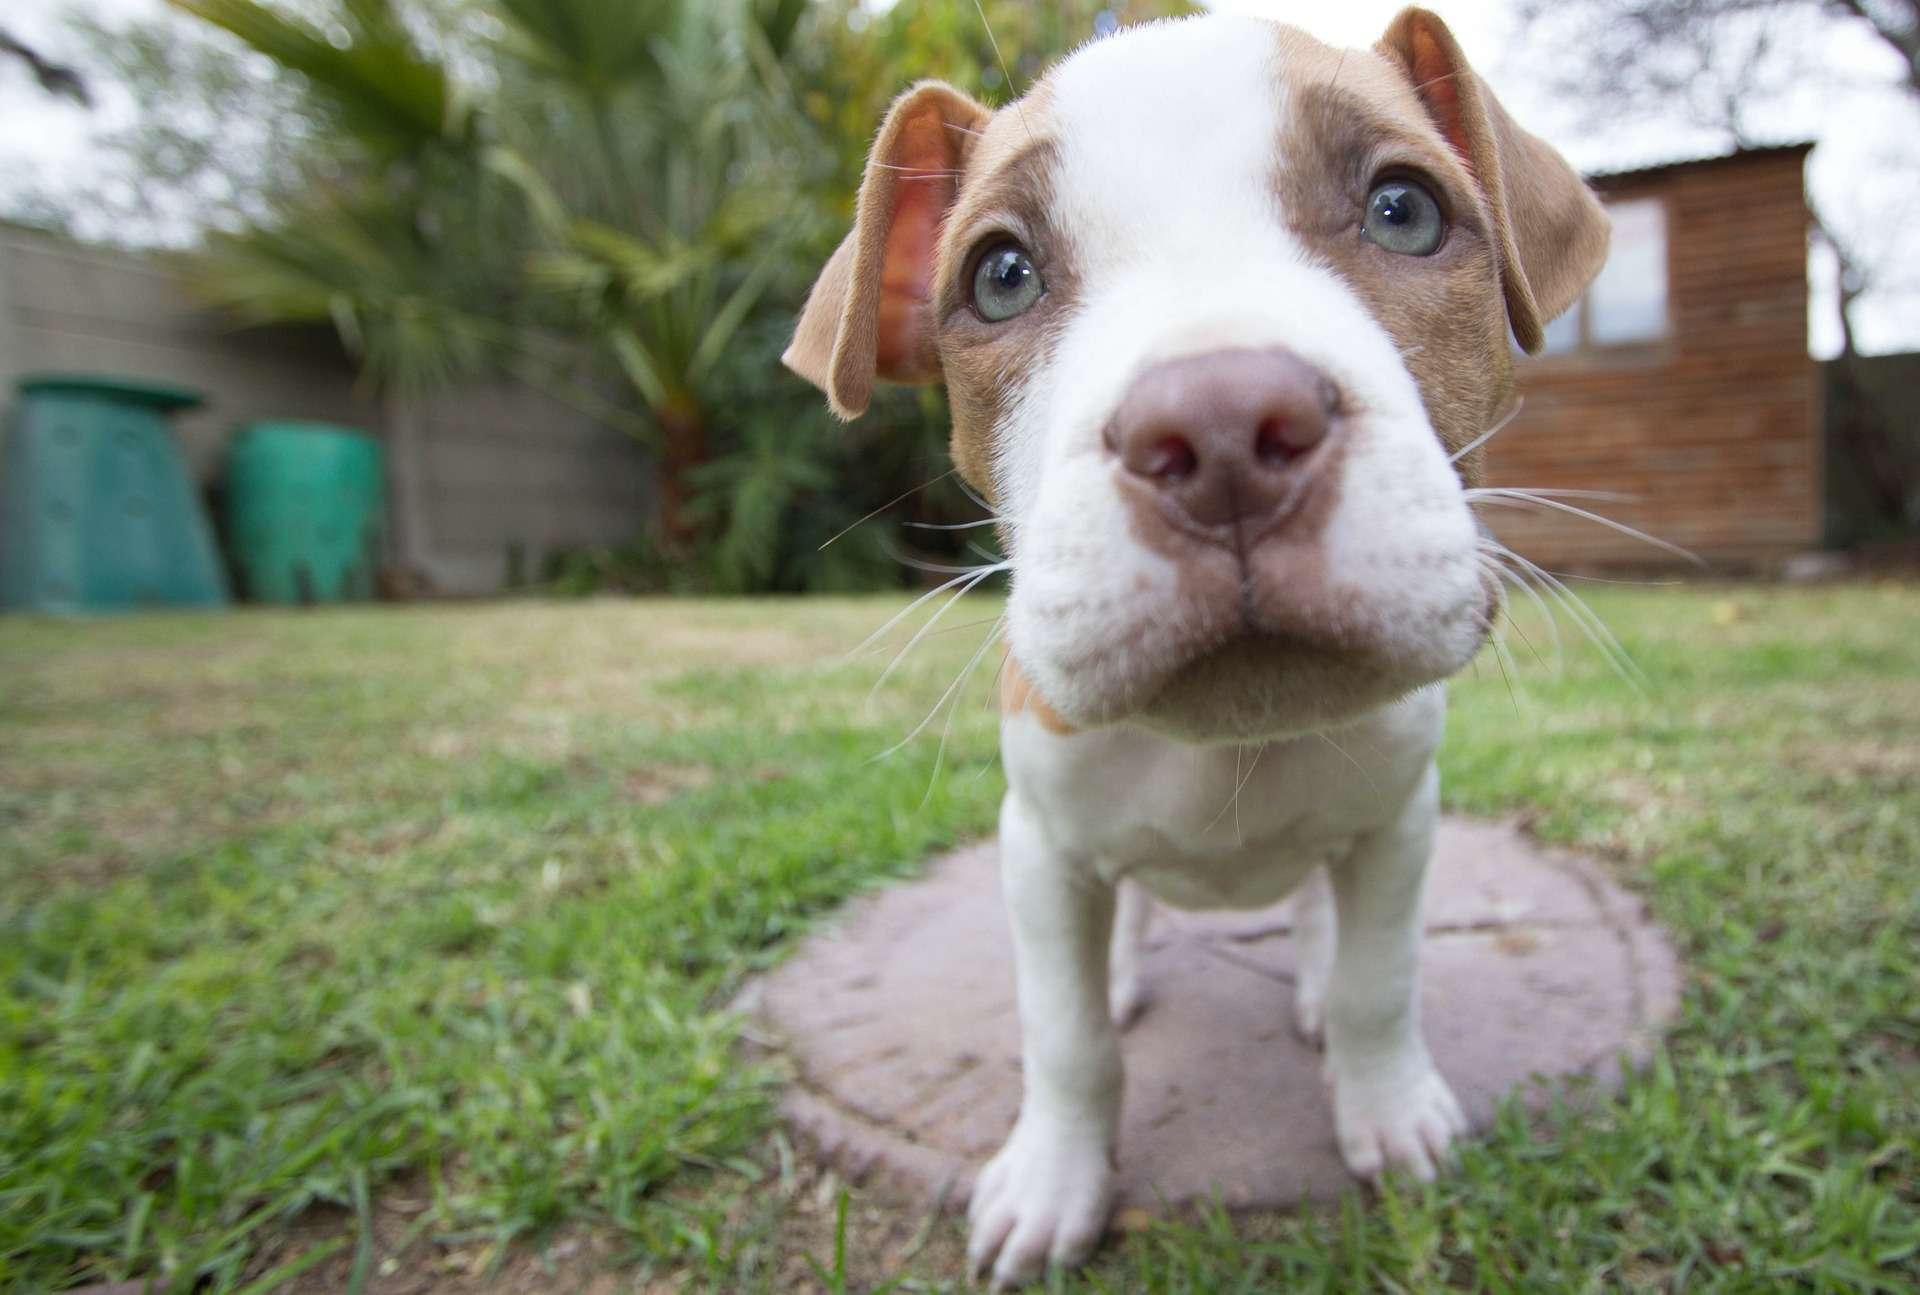 A wide angle photo of a pitbull puppy.